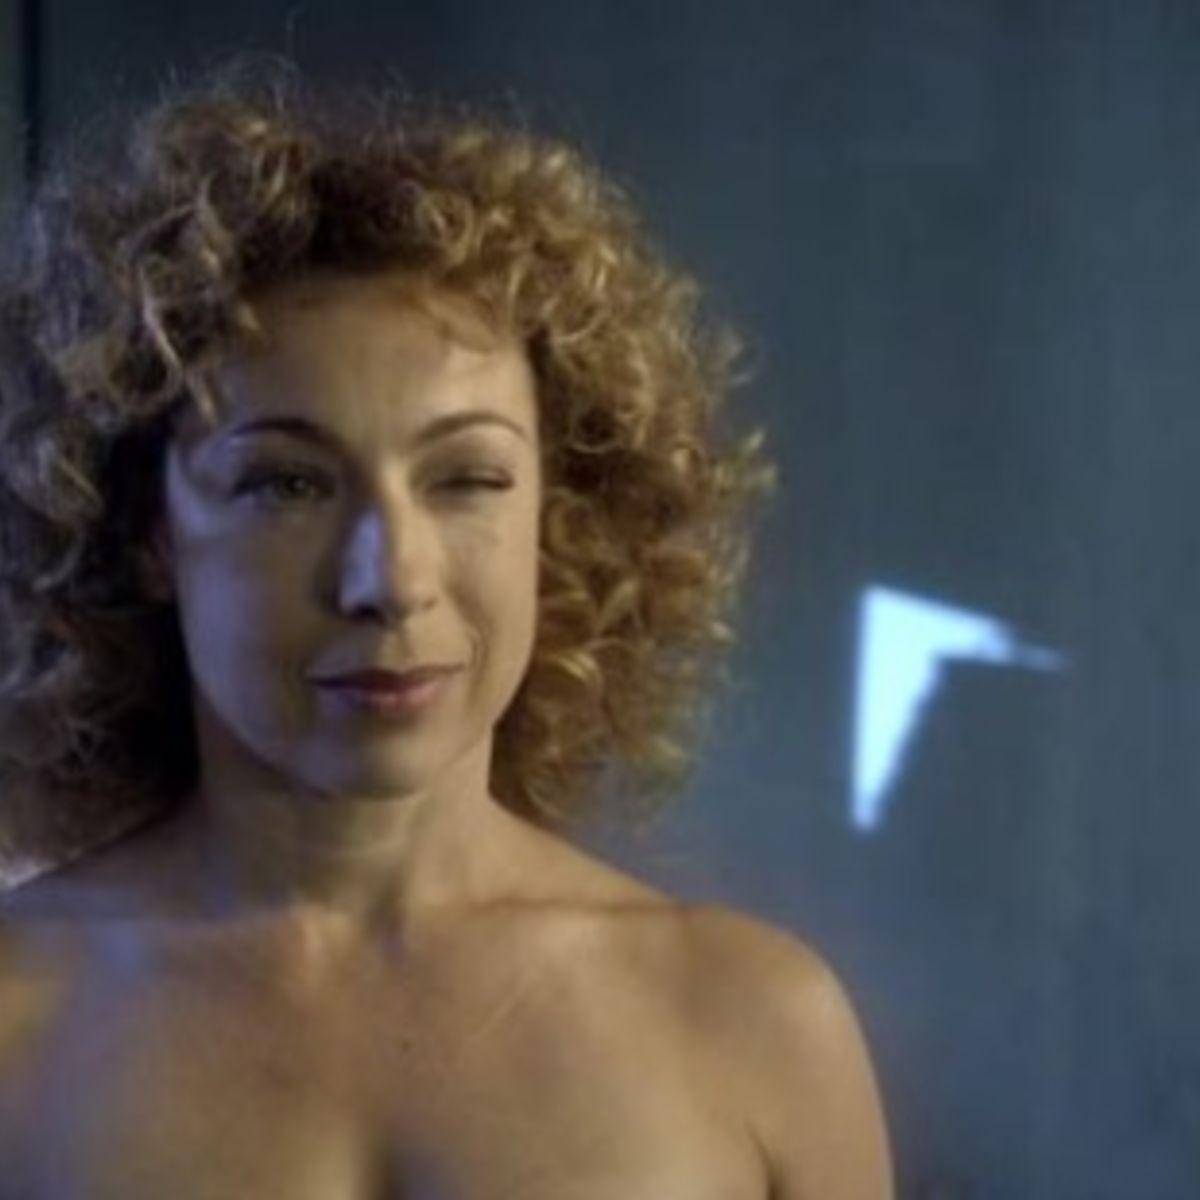 doctor-who-series-6-trailer-River-naked_1.jpg